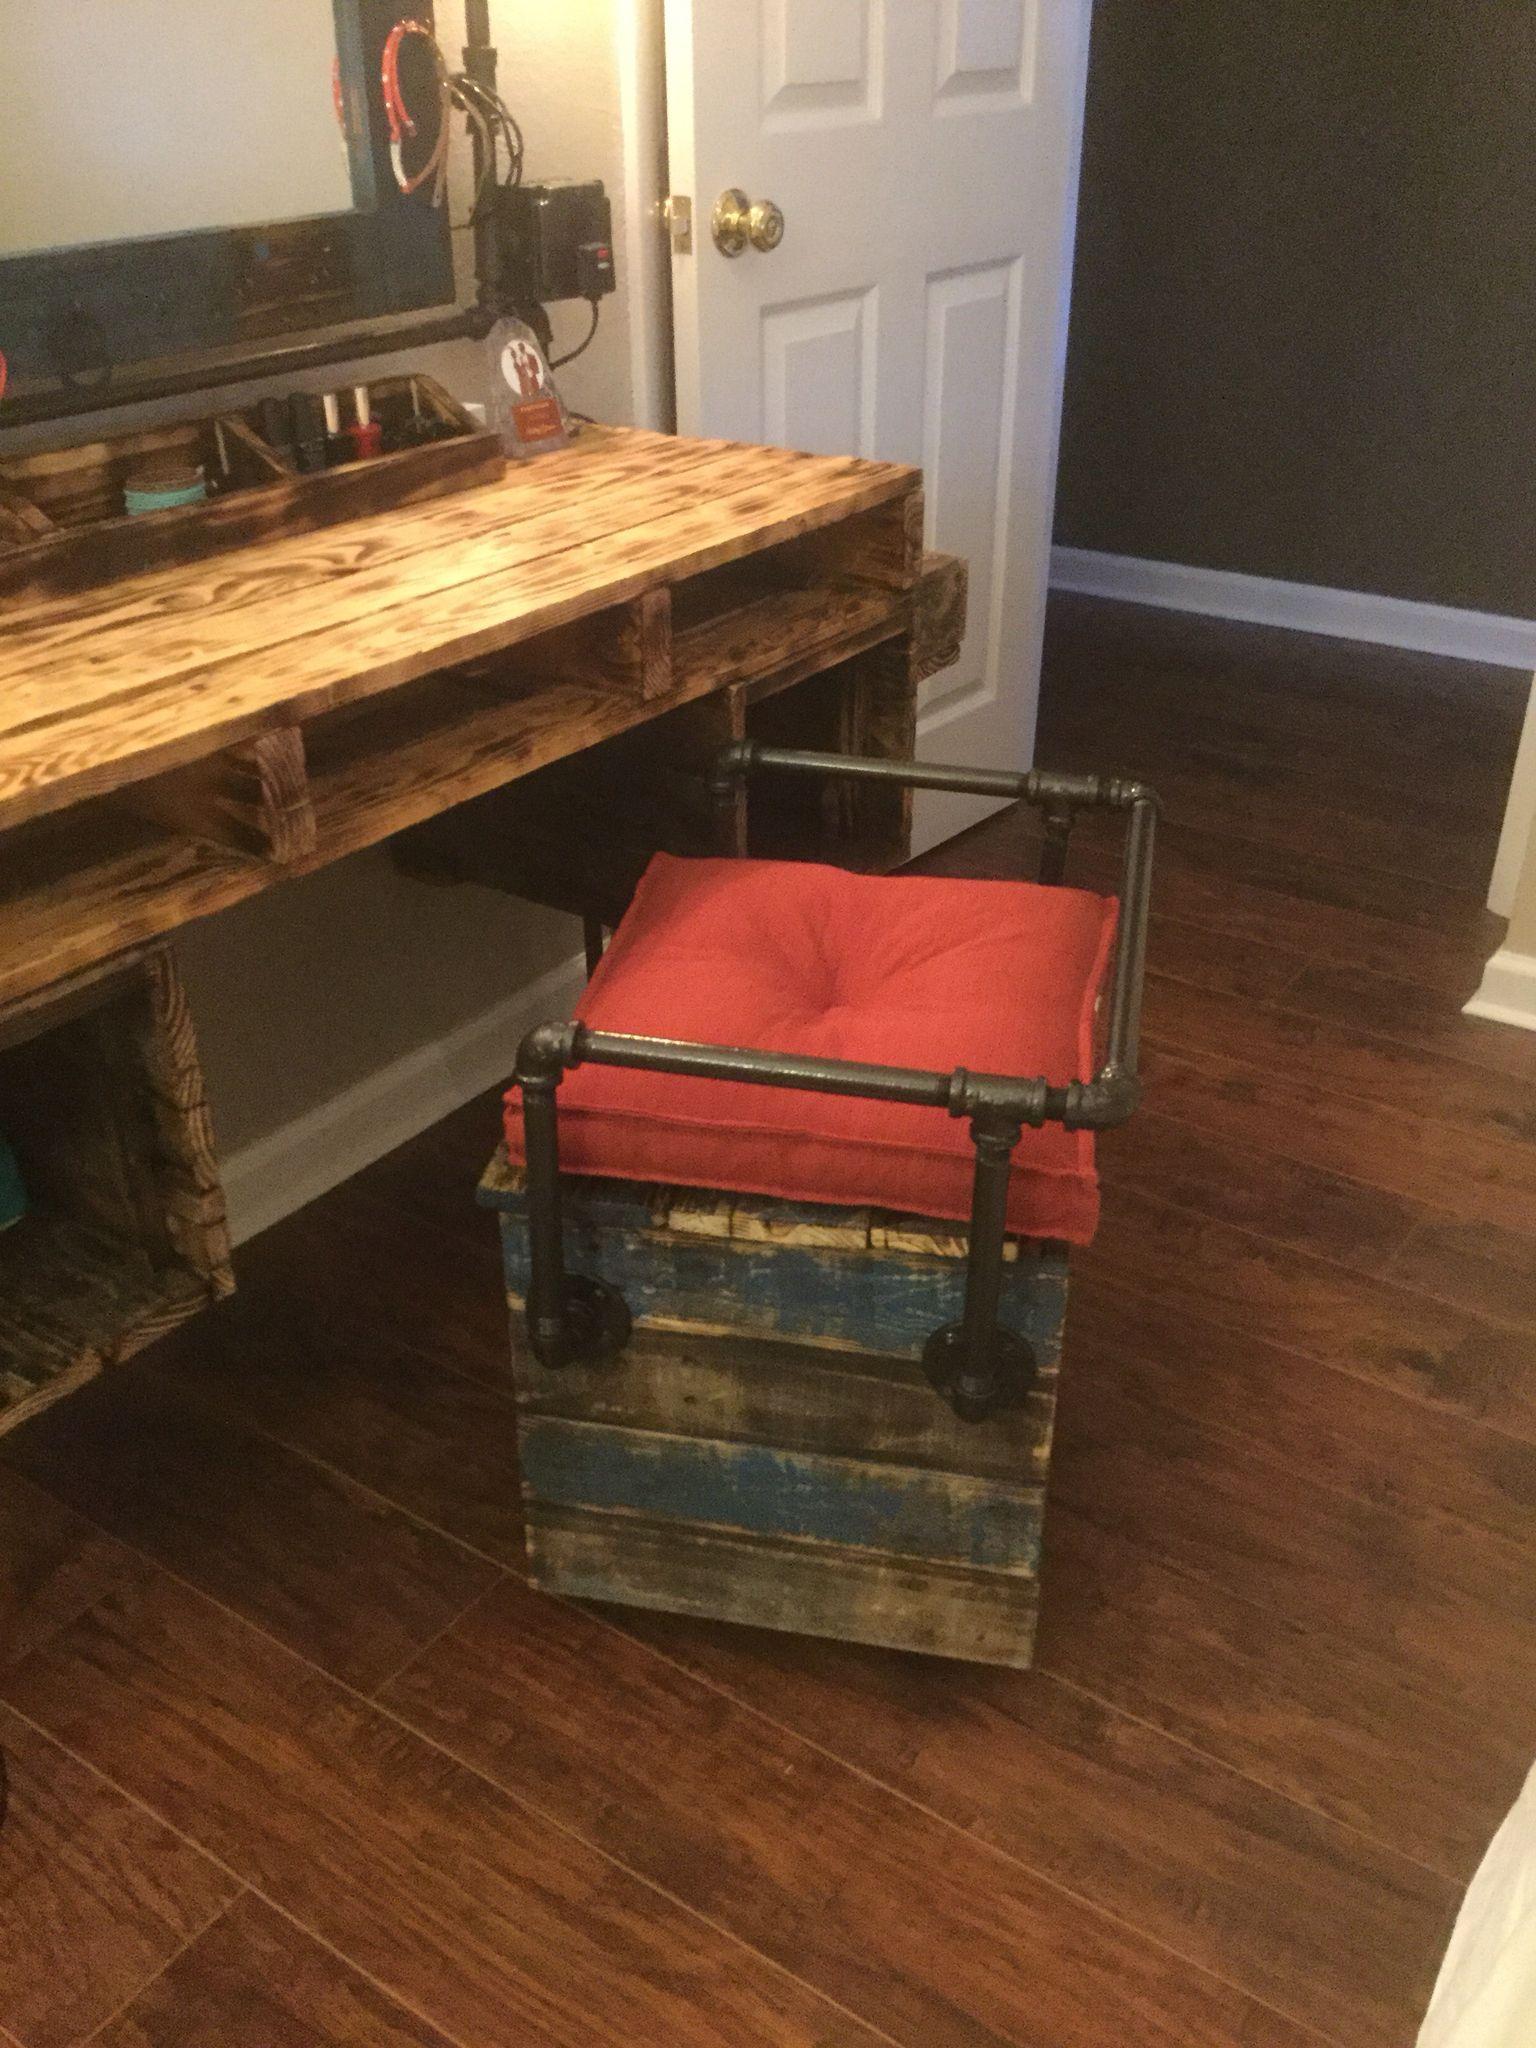 Bedroom Furniture Made Out Of Pallets pallet furniture, black pipe, pallet vanity, makeup table